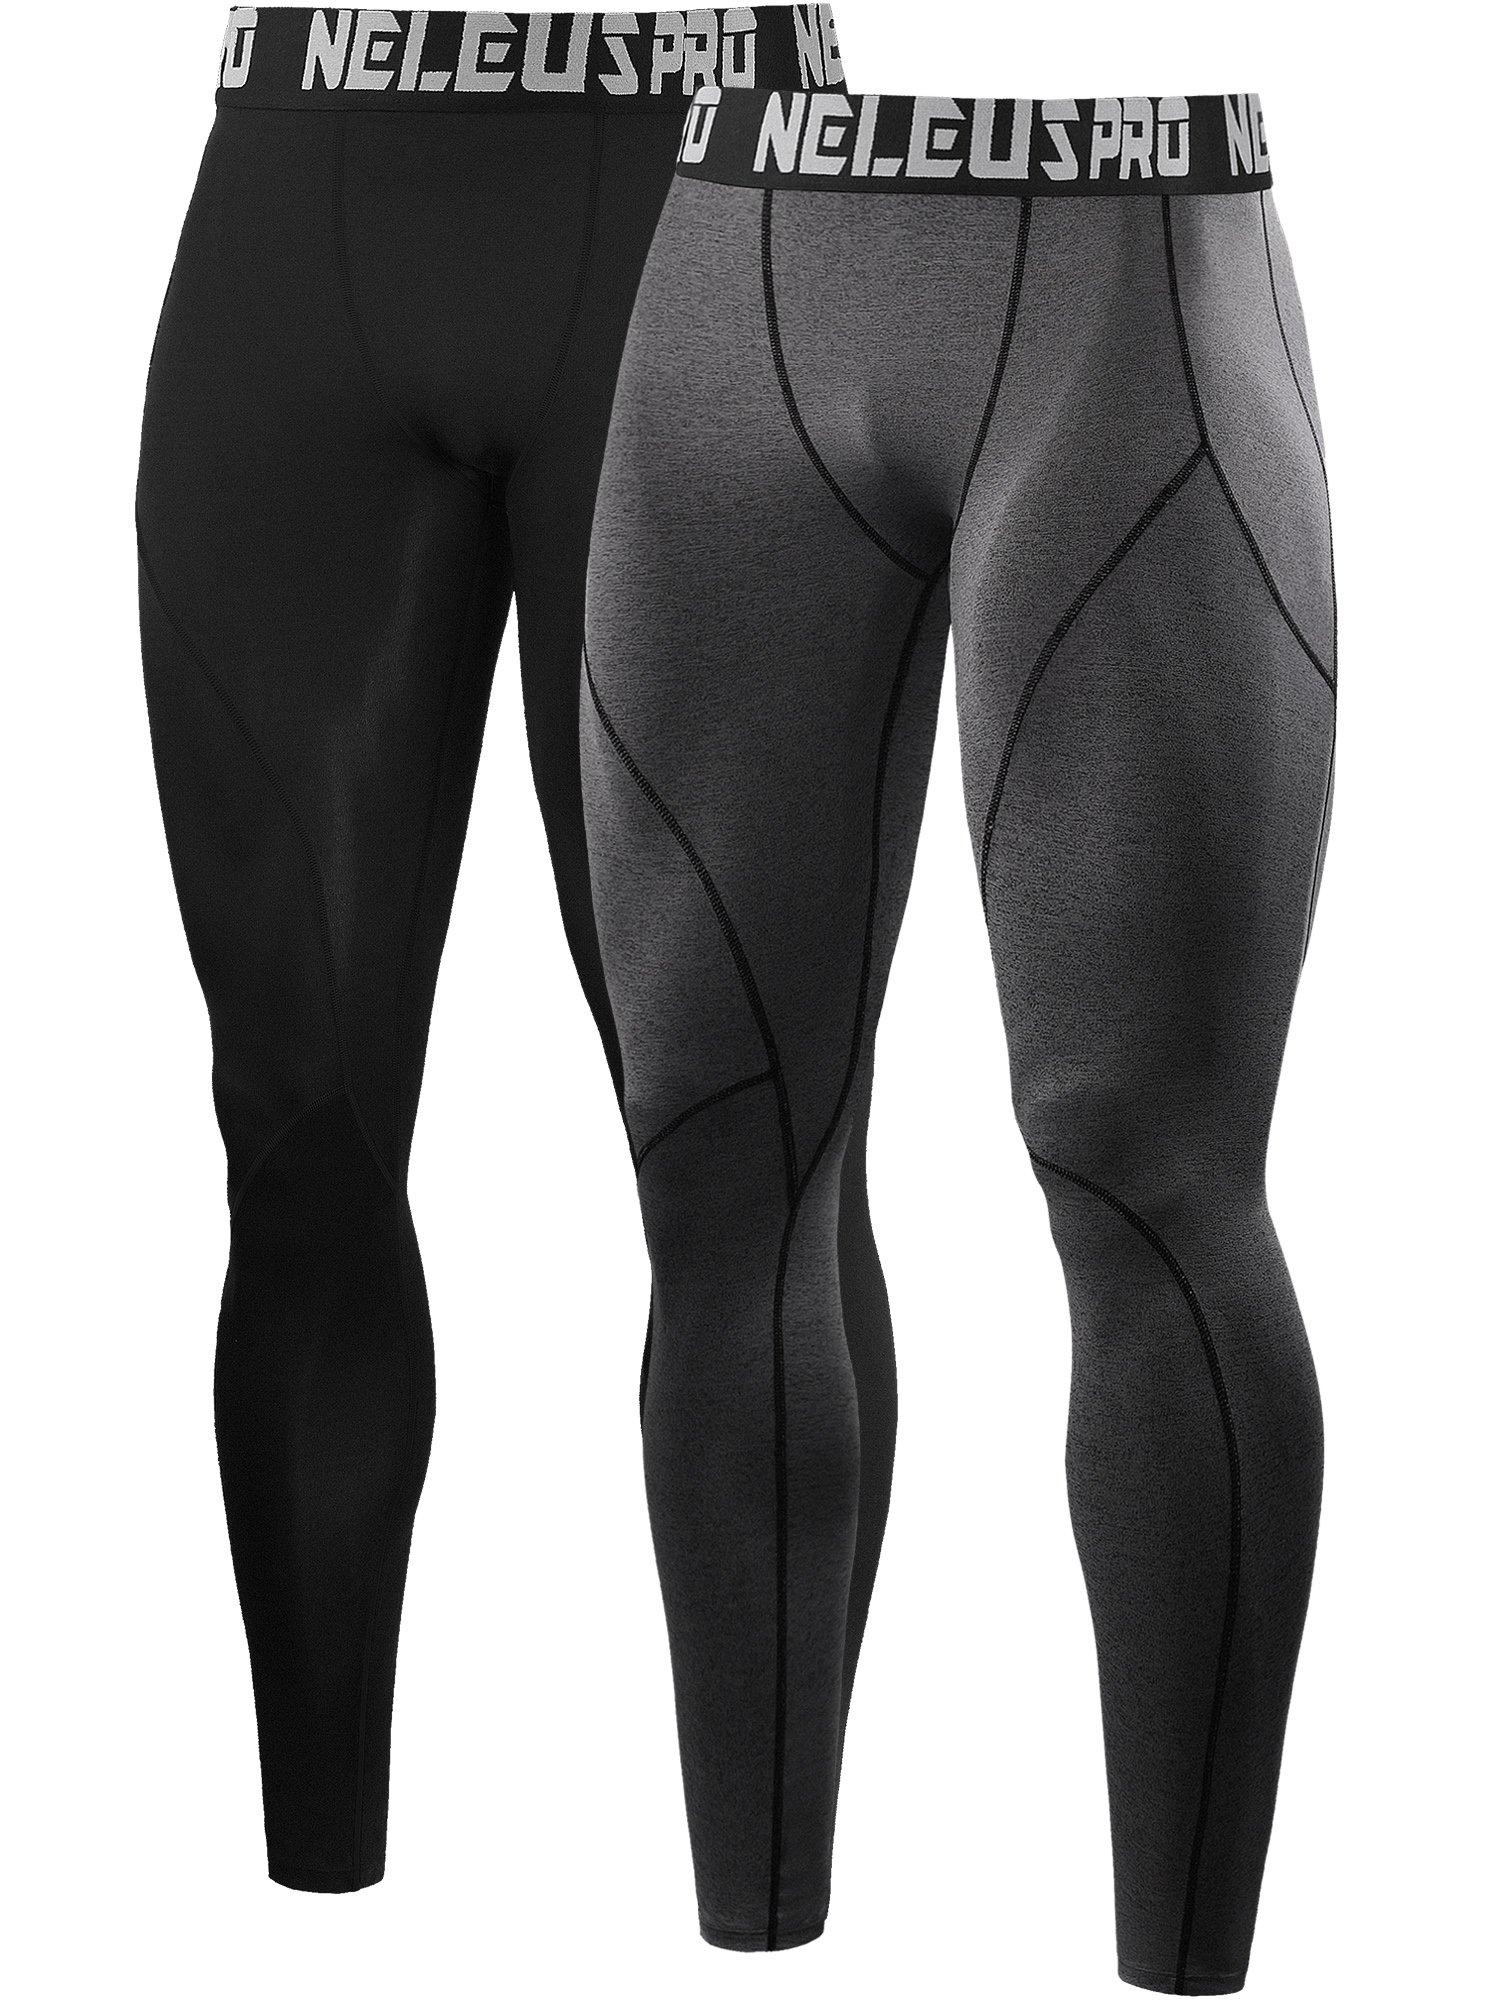 Neleus Men's 2 Pack Compression Pants Workout Running Tights Leggings,6013,Black,Grey,US S,EU M